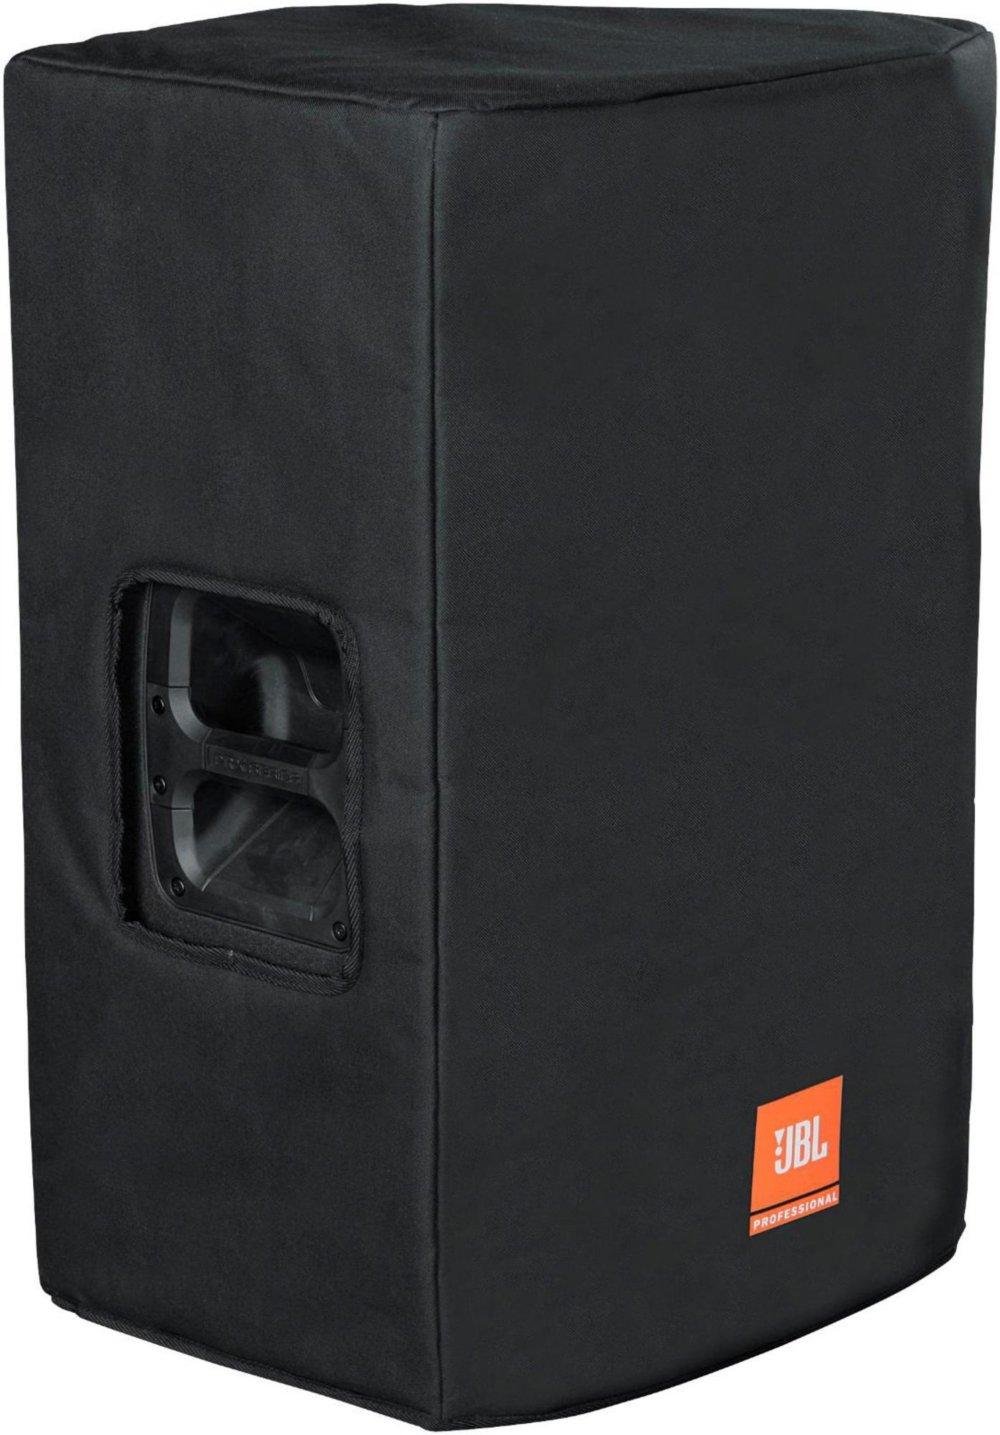 JBL Bags PRX815W-CVR Deluxe Protective Padded Cover for Loud Speaker